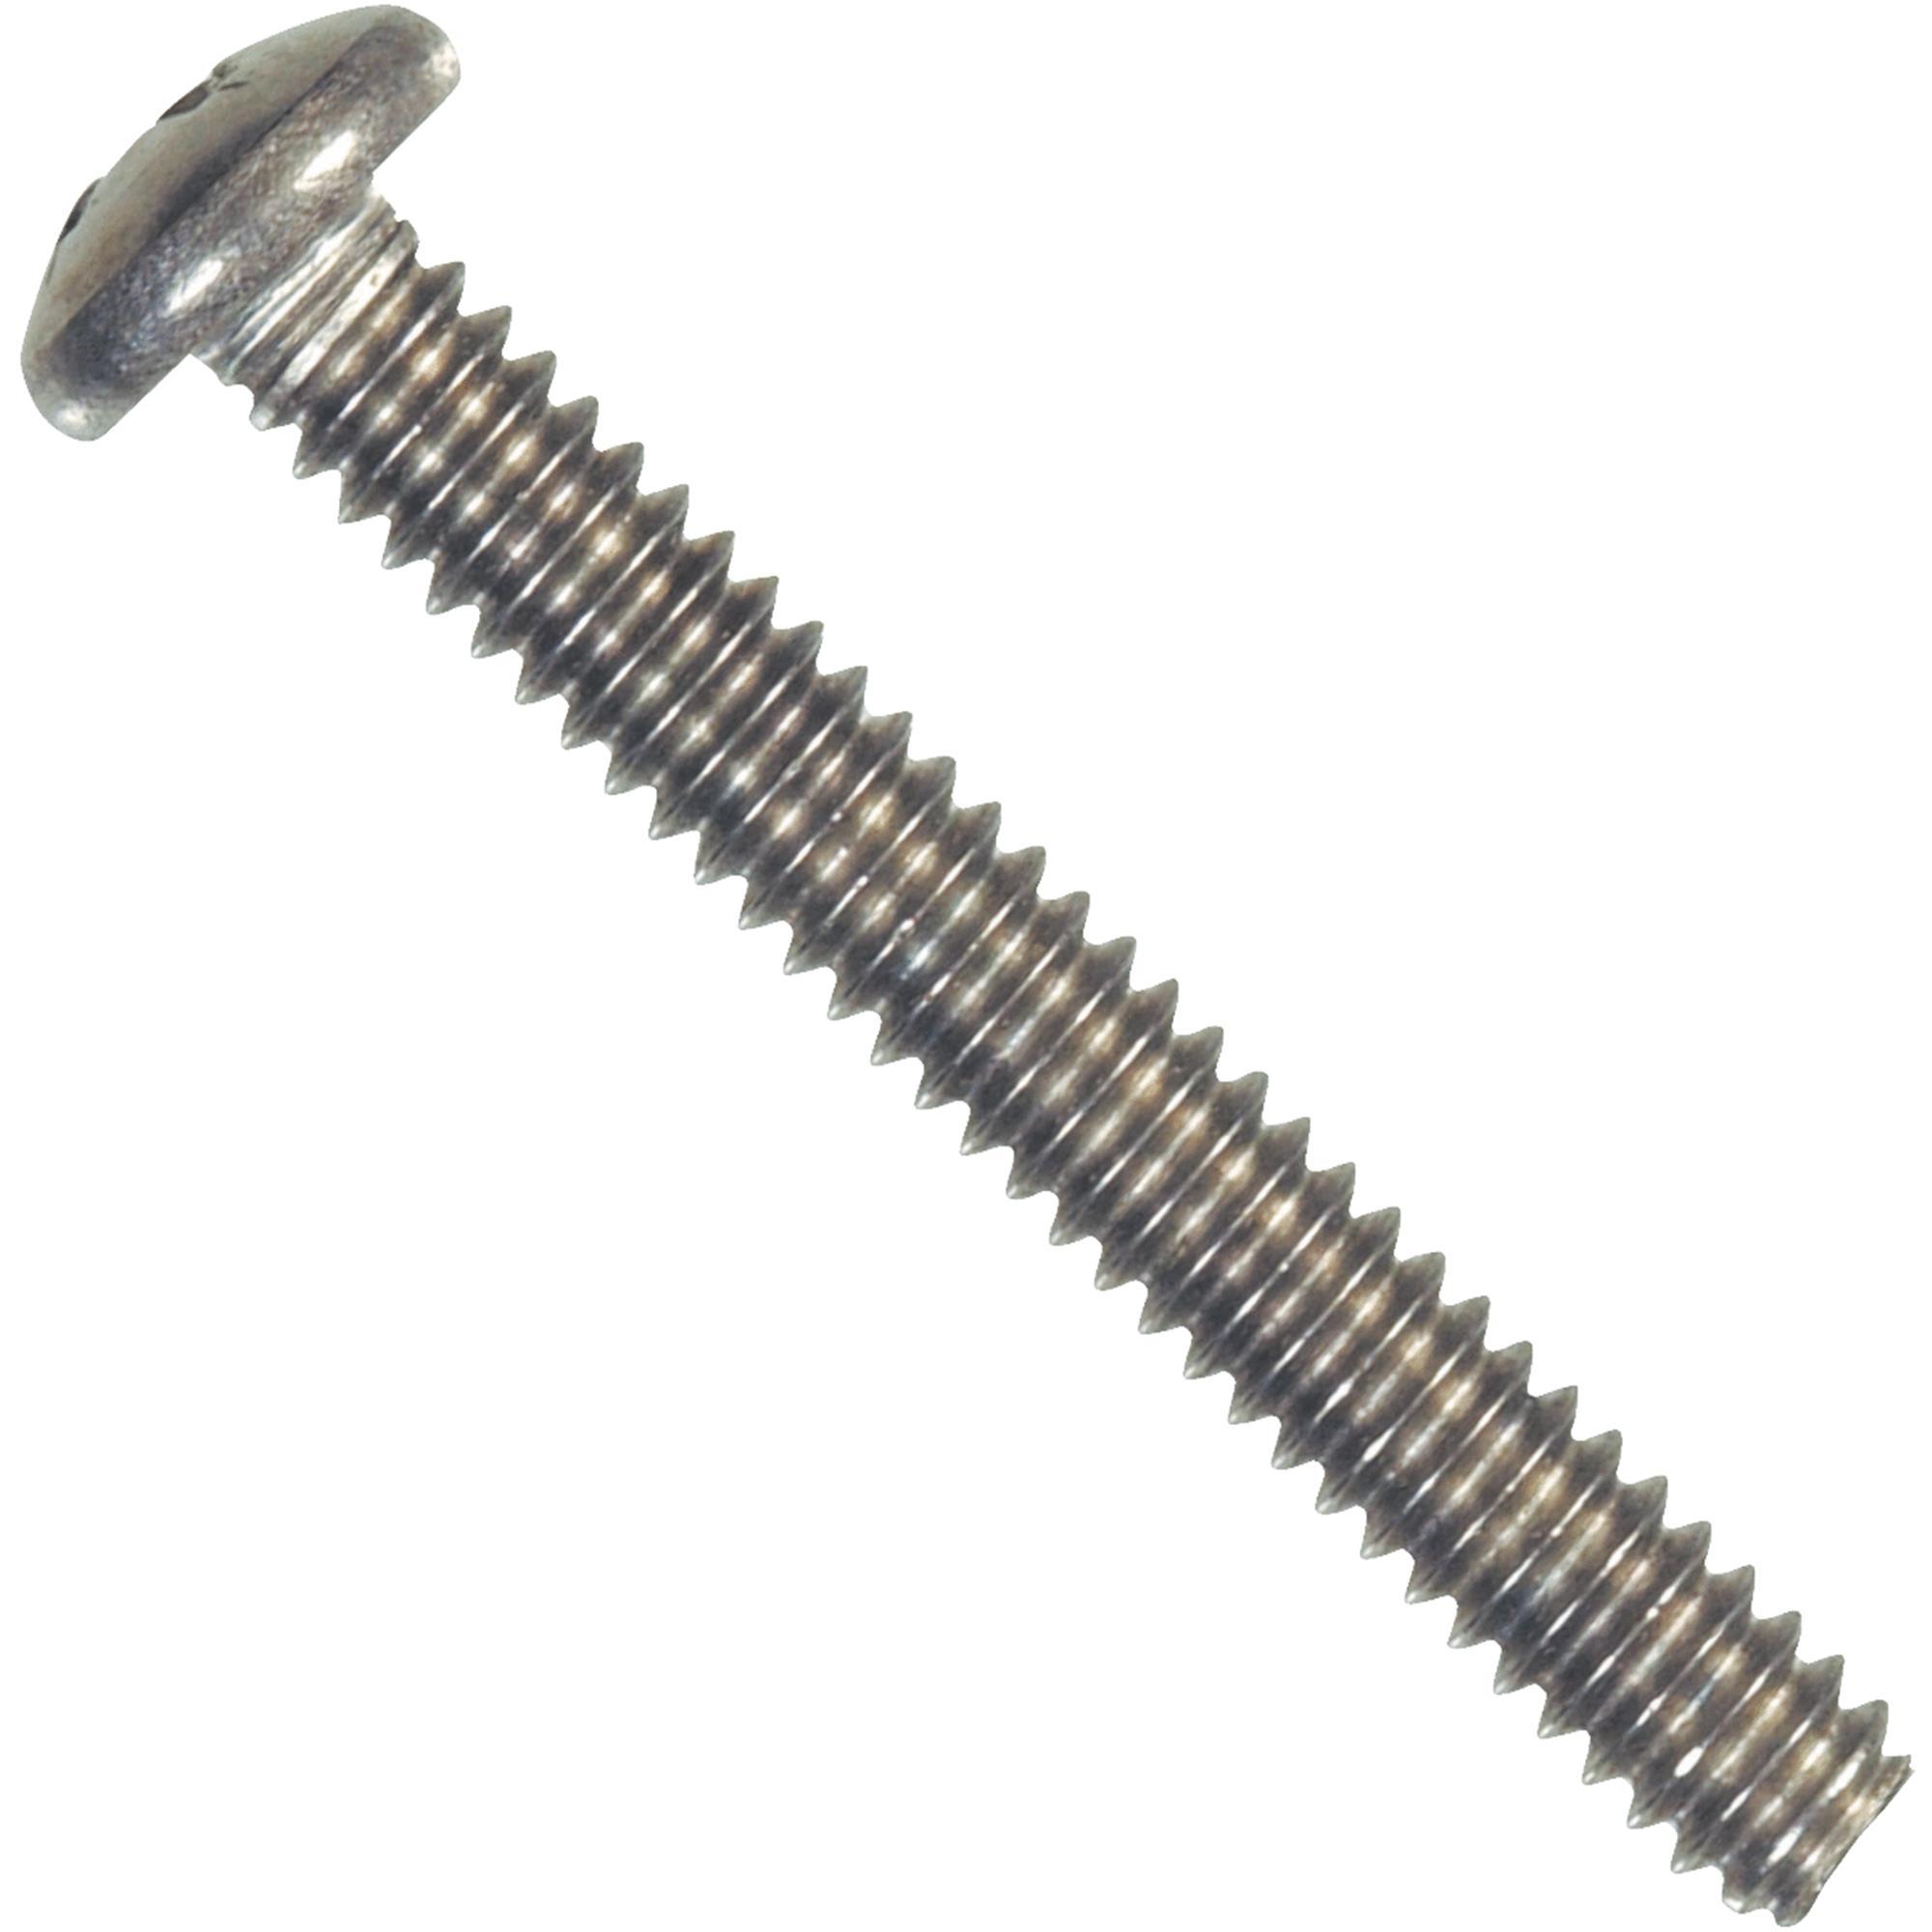 Hillman Fasteners 828588 Machine Screws, Phillips Pan Head, Stainless Steel, 1/4-20 x 3/4-In., 100-Pk. - Quantity 1